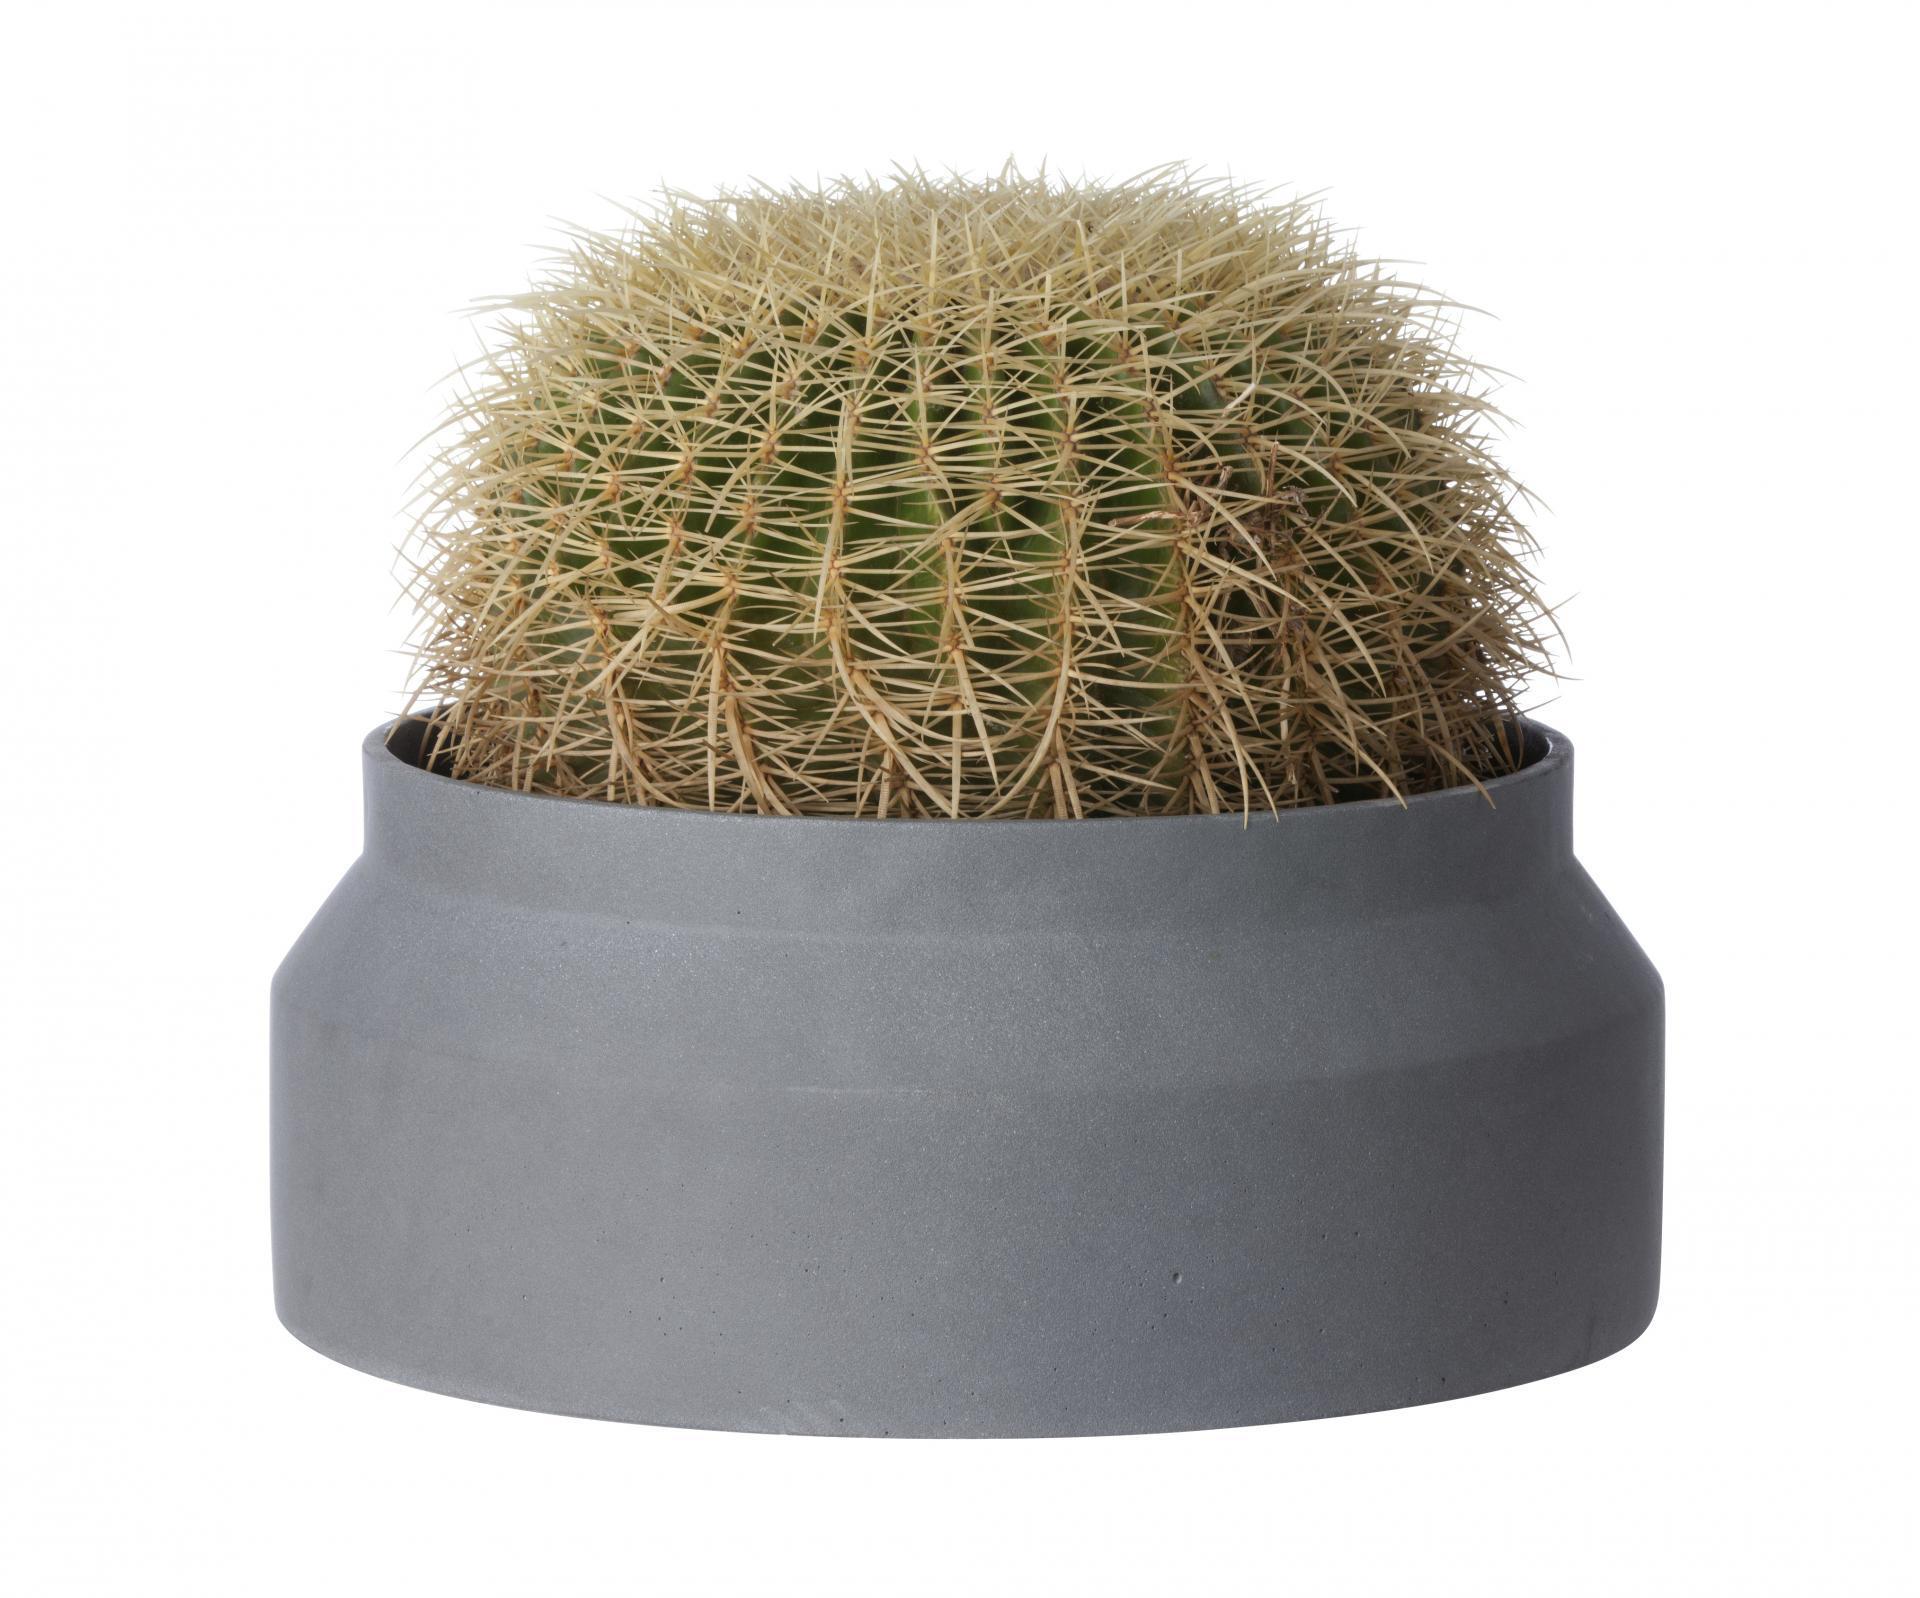 ferm LIVING Betonový květináč Dark Grey Large 45 cm, šedá barva, beton